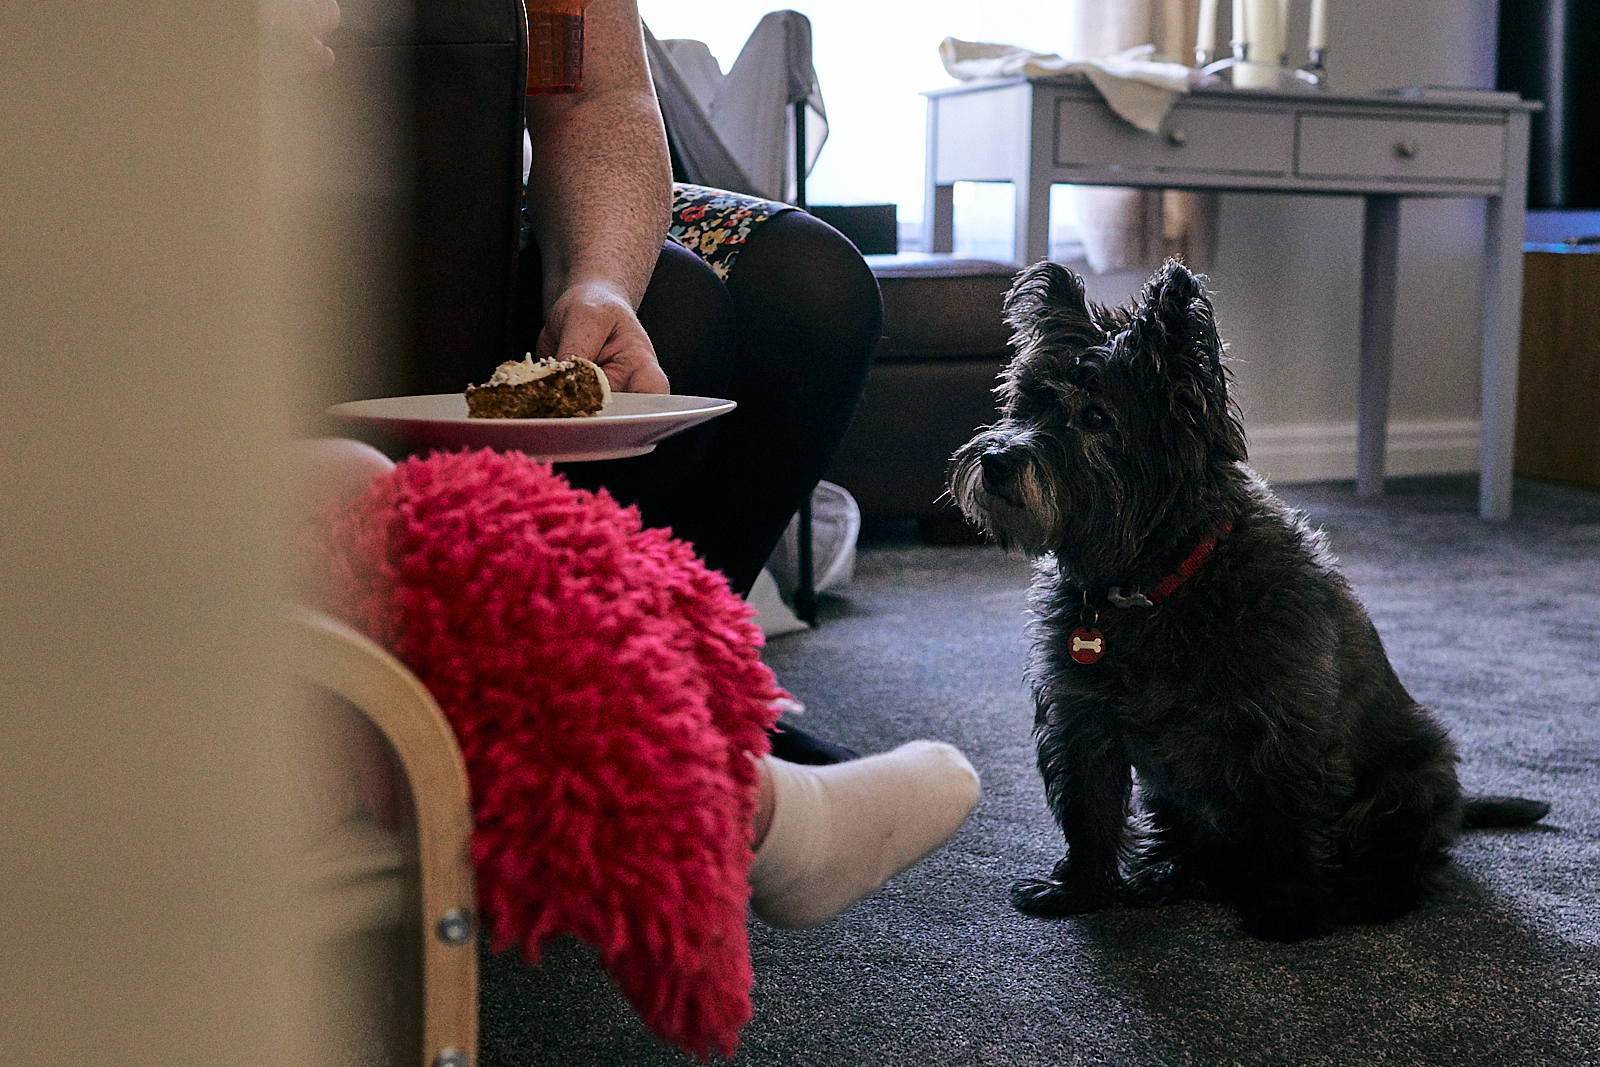 dog watches little girl eat christening cake